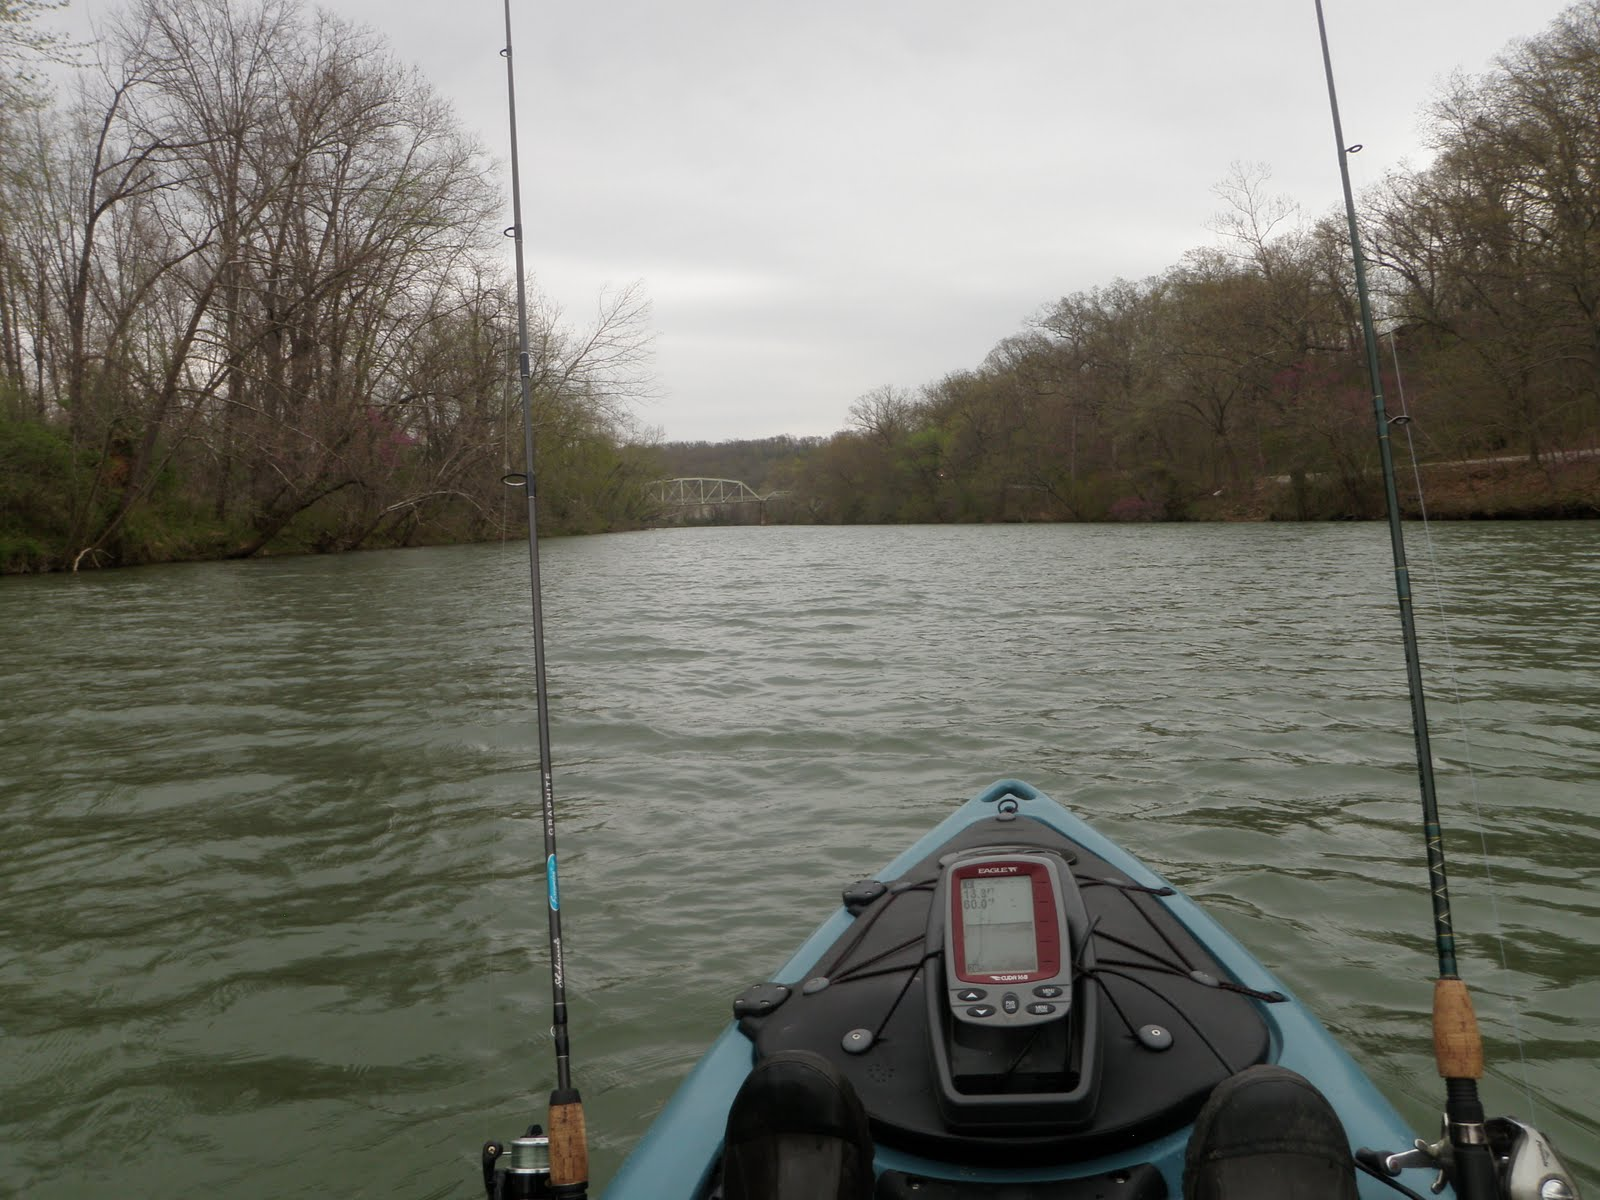 Fish missouri james river lake springfield april 6th for James river fishing